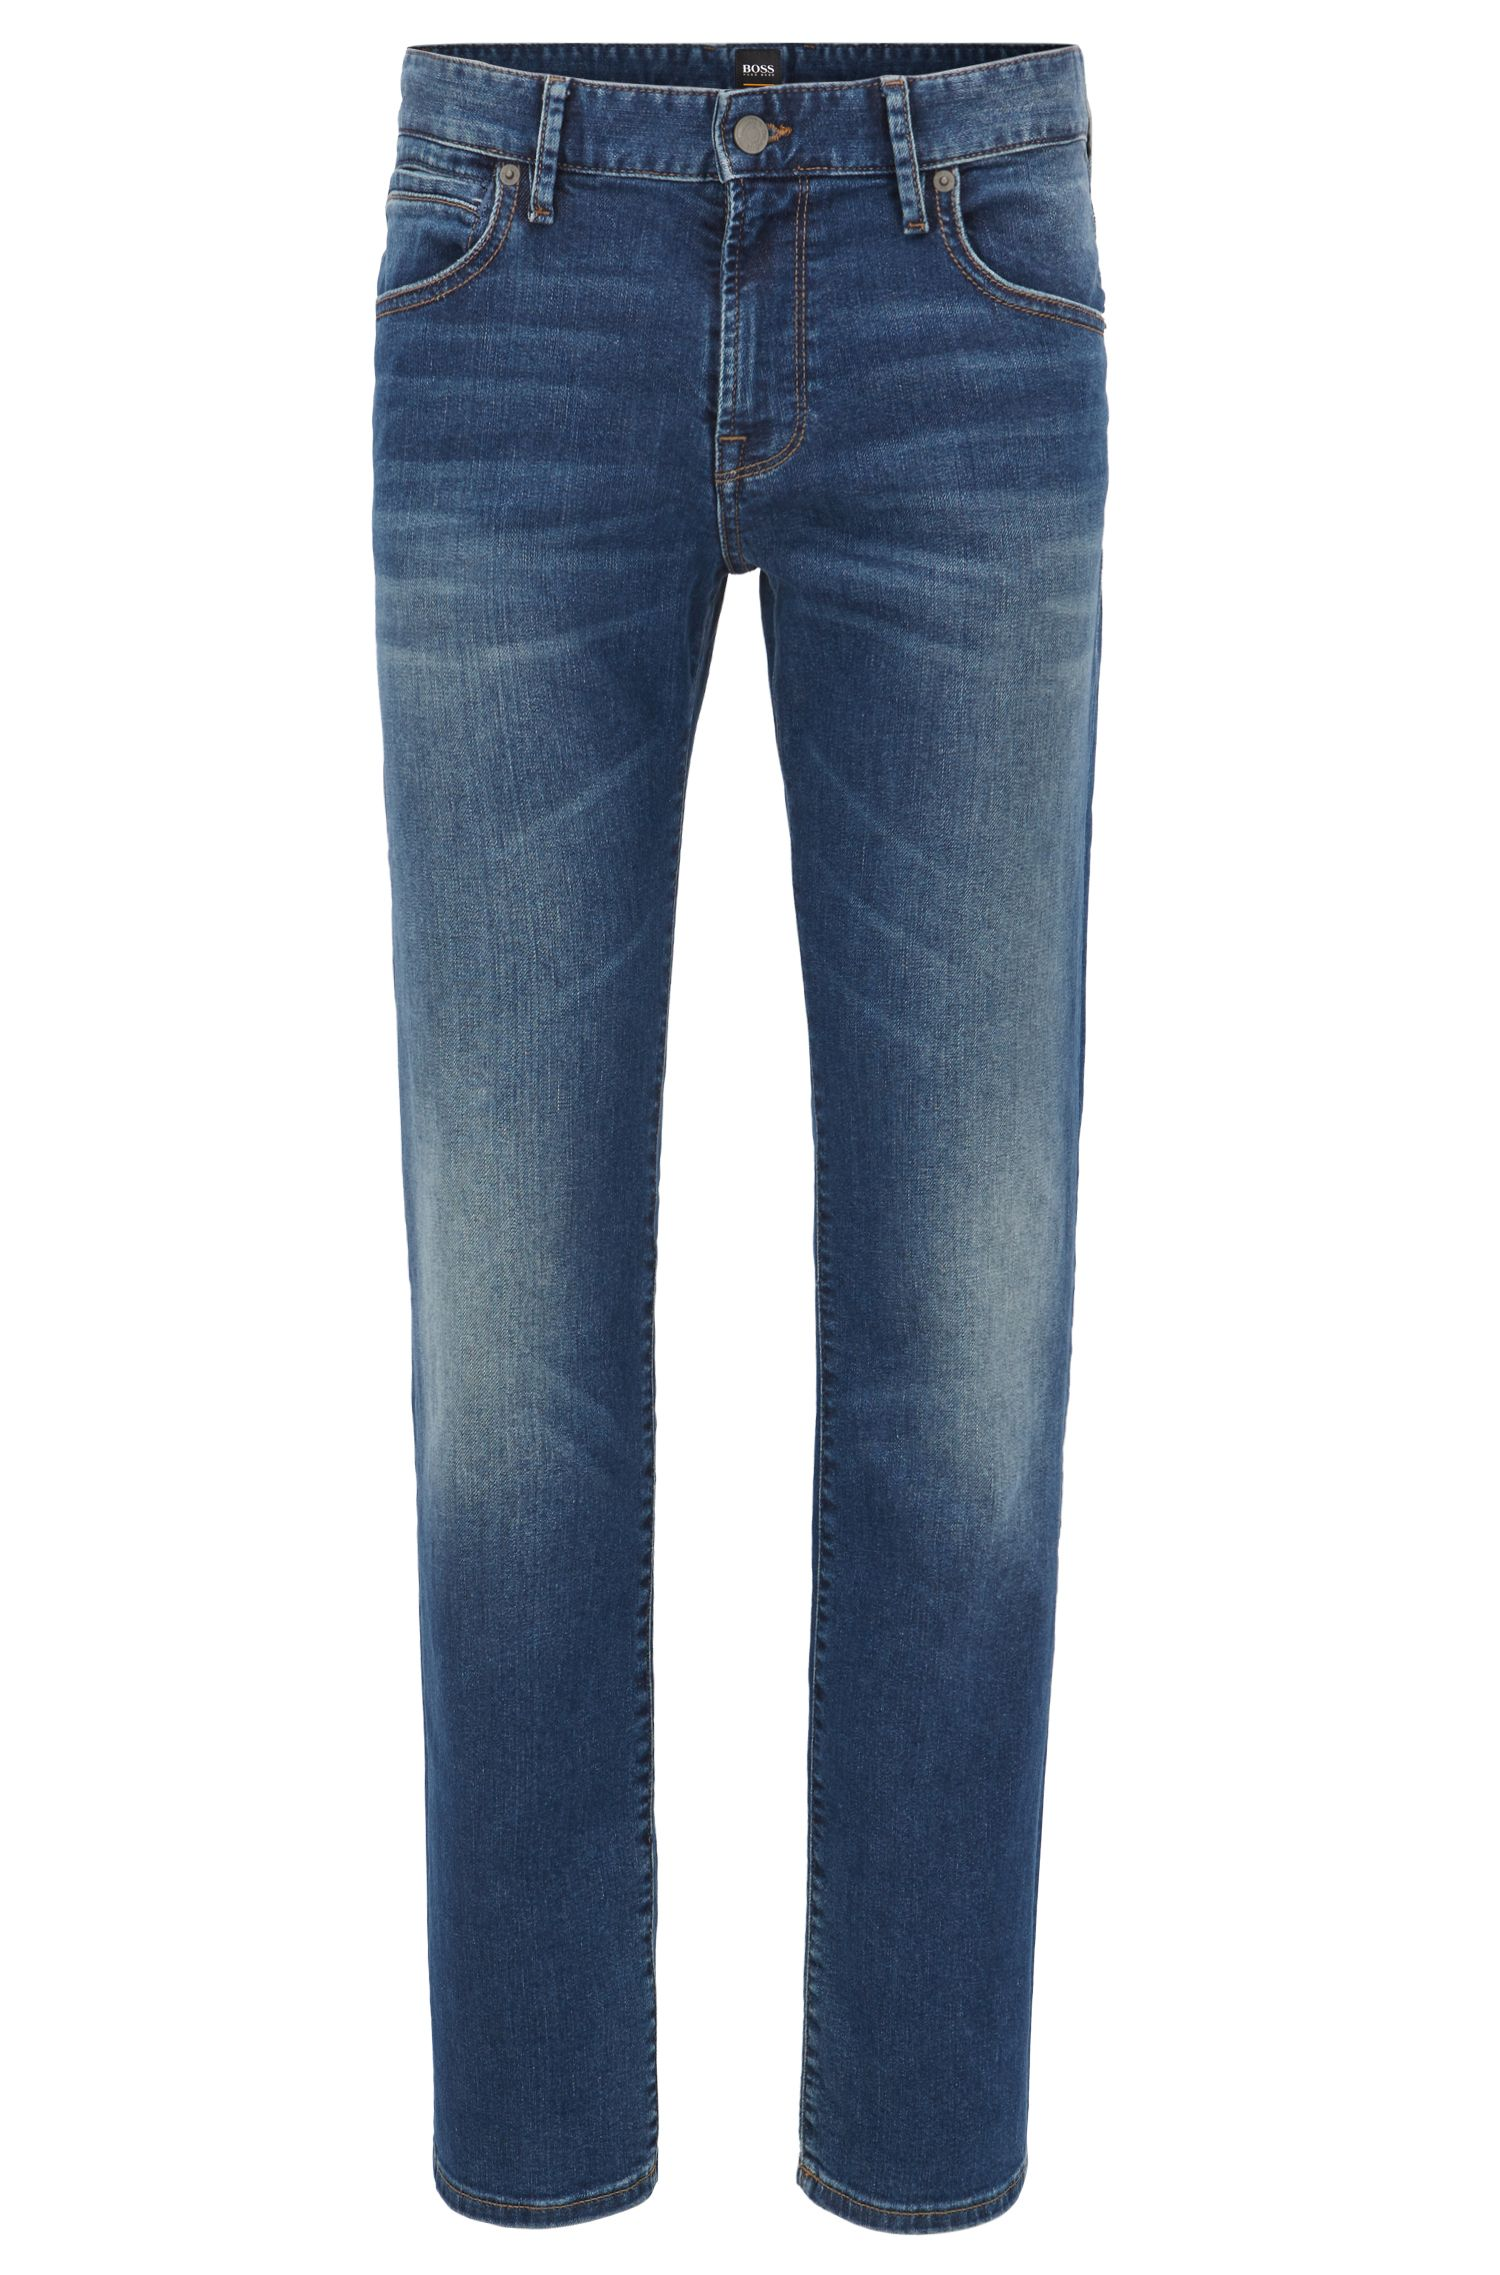 Jeans Regular Fit en denim indigo délavé